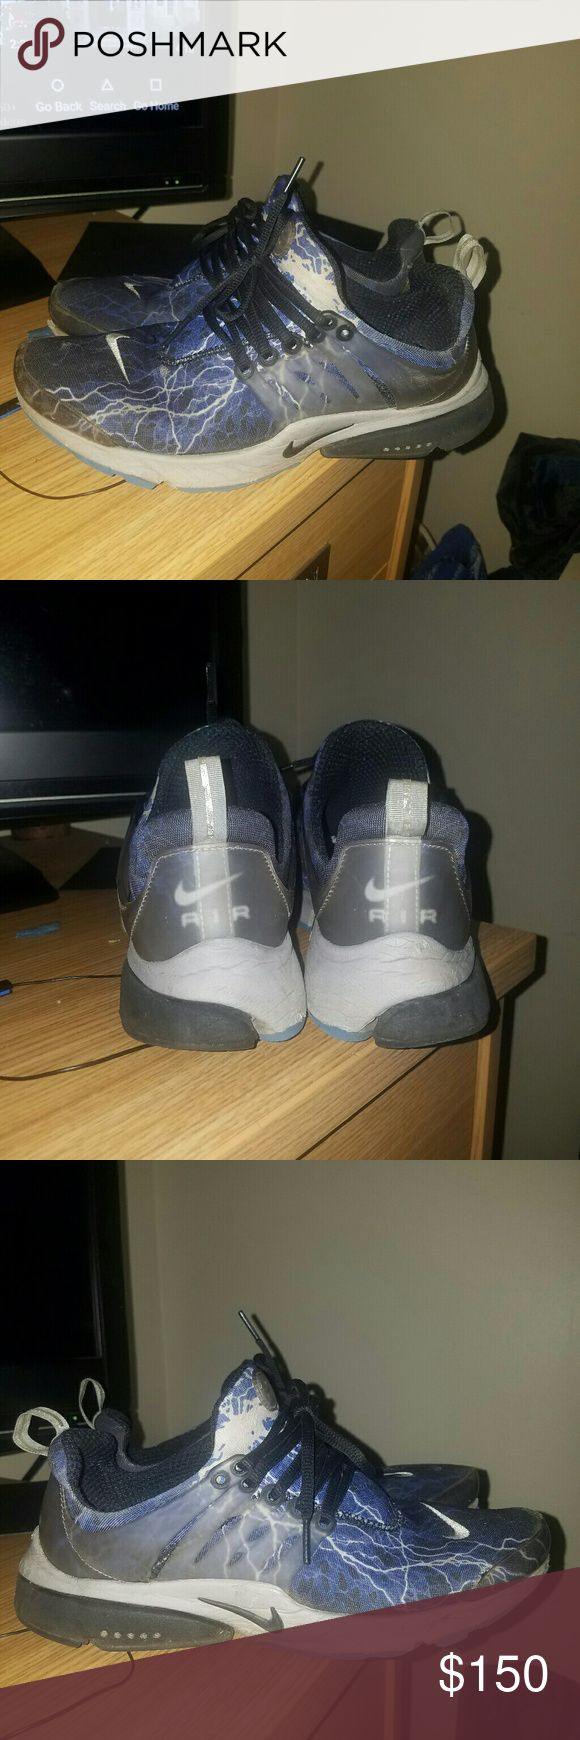 Nike Presto Lightning Sz XS (8-9) Got these 2015 Nike Shoes